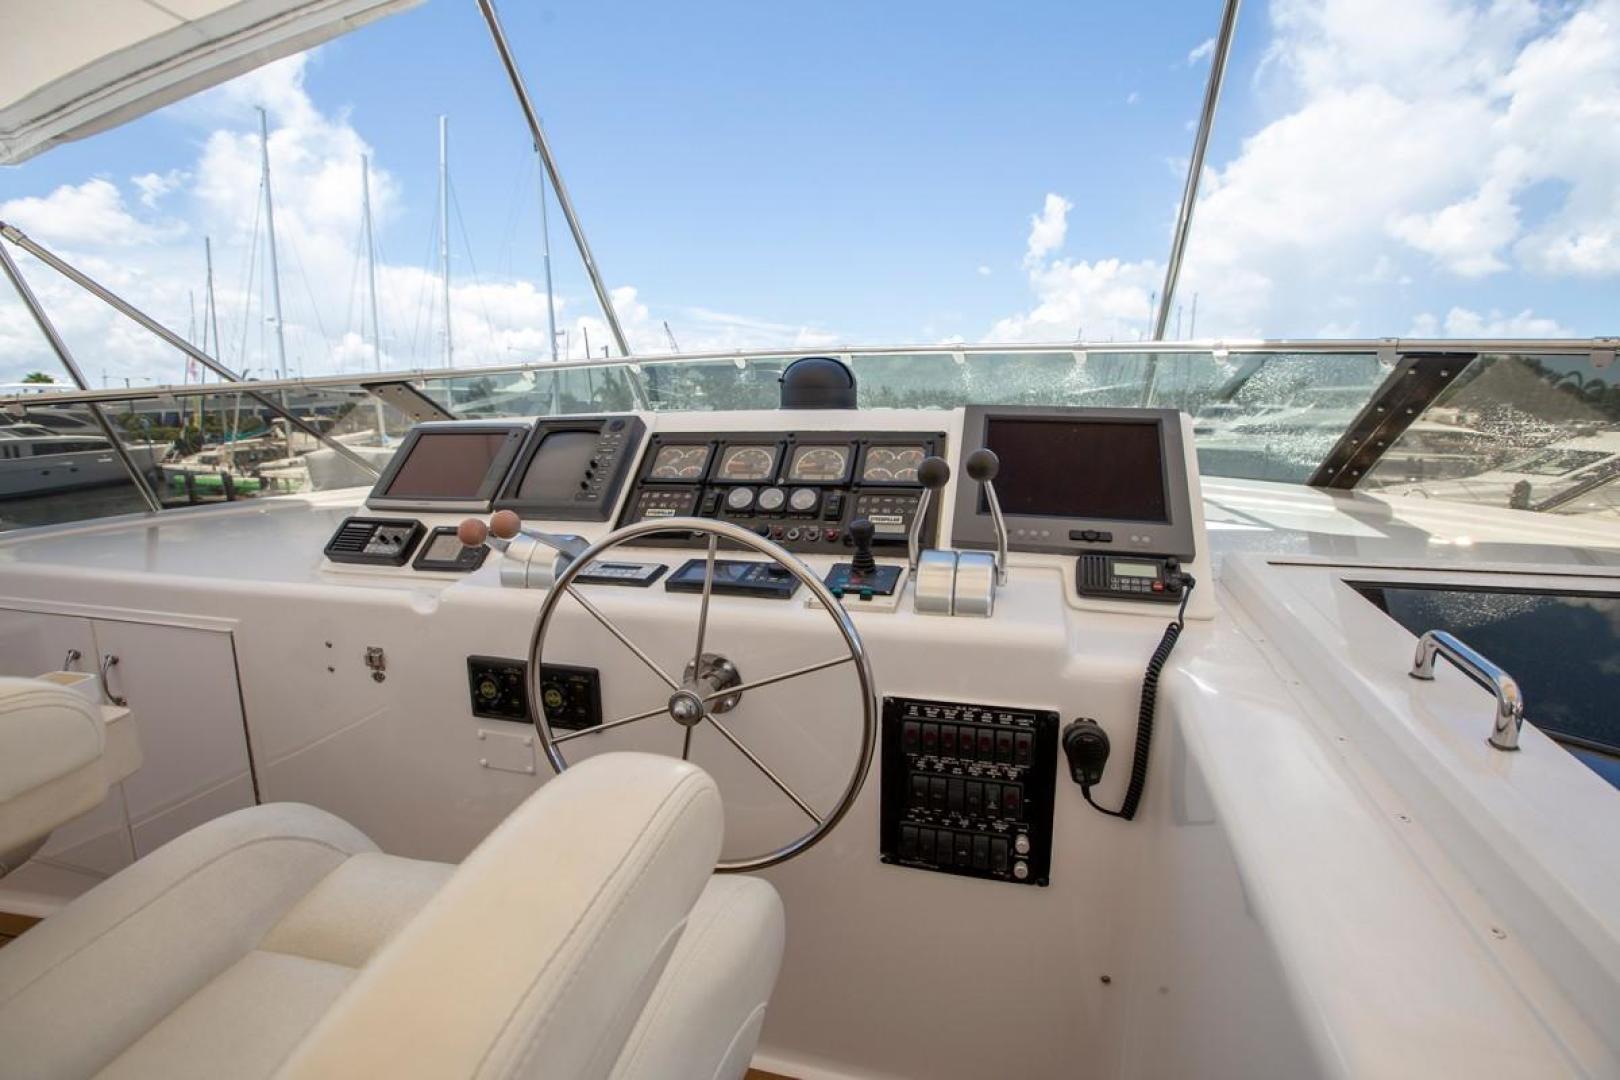 Hatteras-Cockpit Motor Yacht 2000-Getaway Ft. Lauderdale-Florida-United States-977396 | Thumbnail